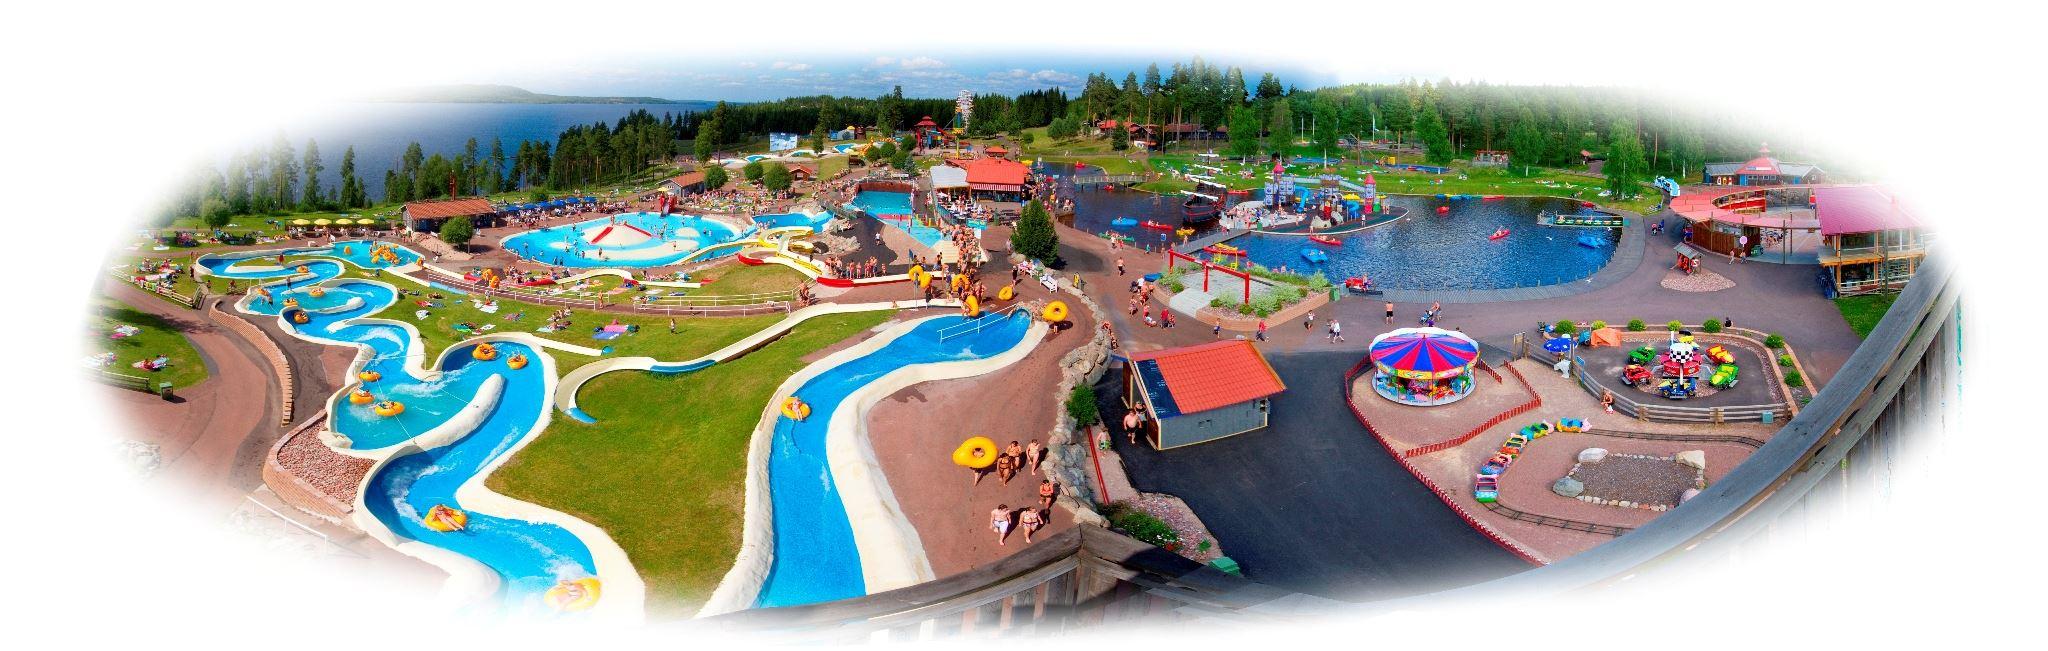 Entrance fee to Leksand Amusementpark (Sommarland)